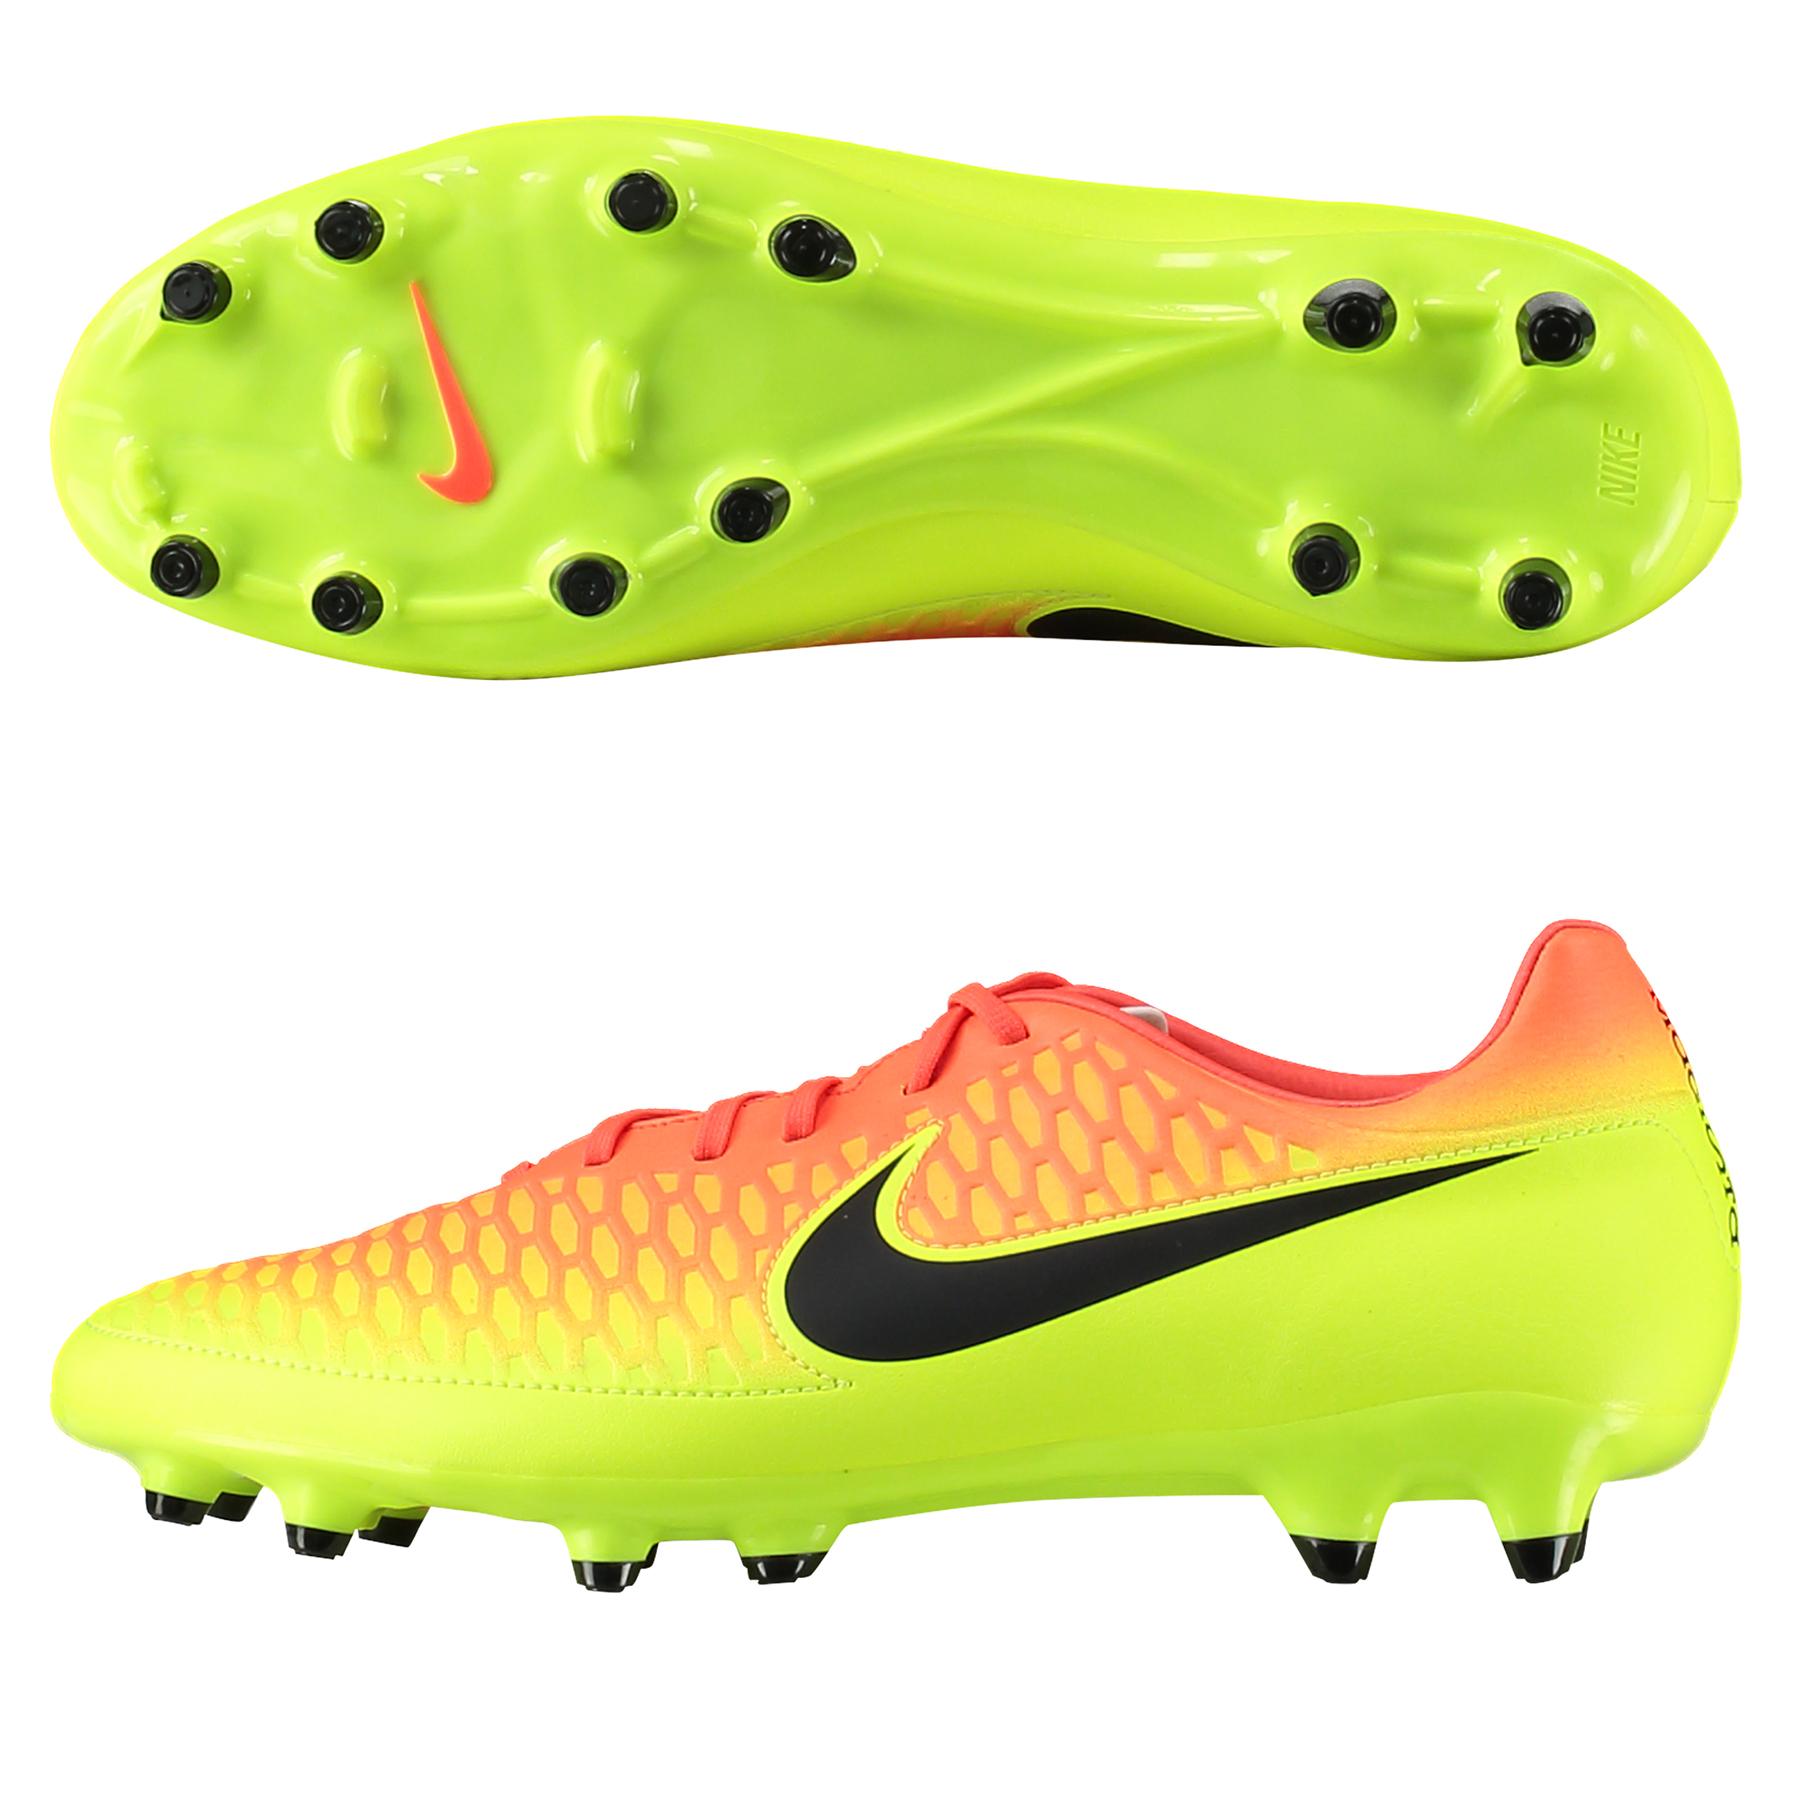 Nike Magista Onda Firm Ground Football Boots - Total Crimson/Black/Vol